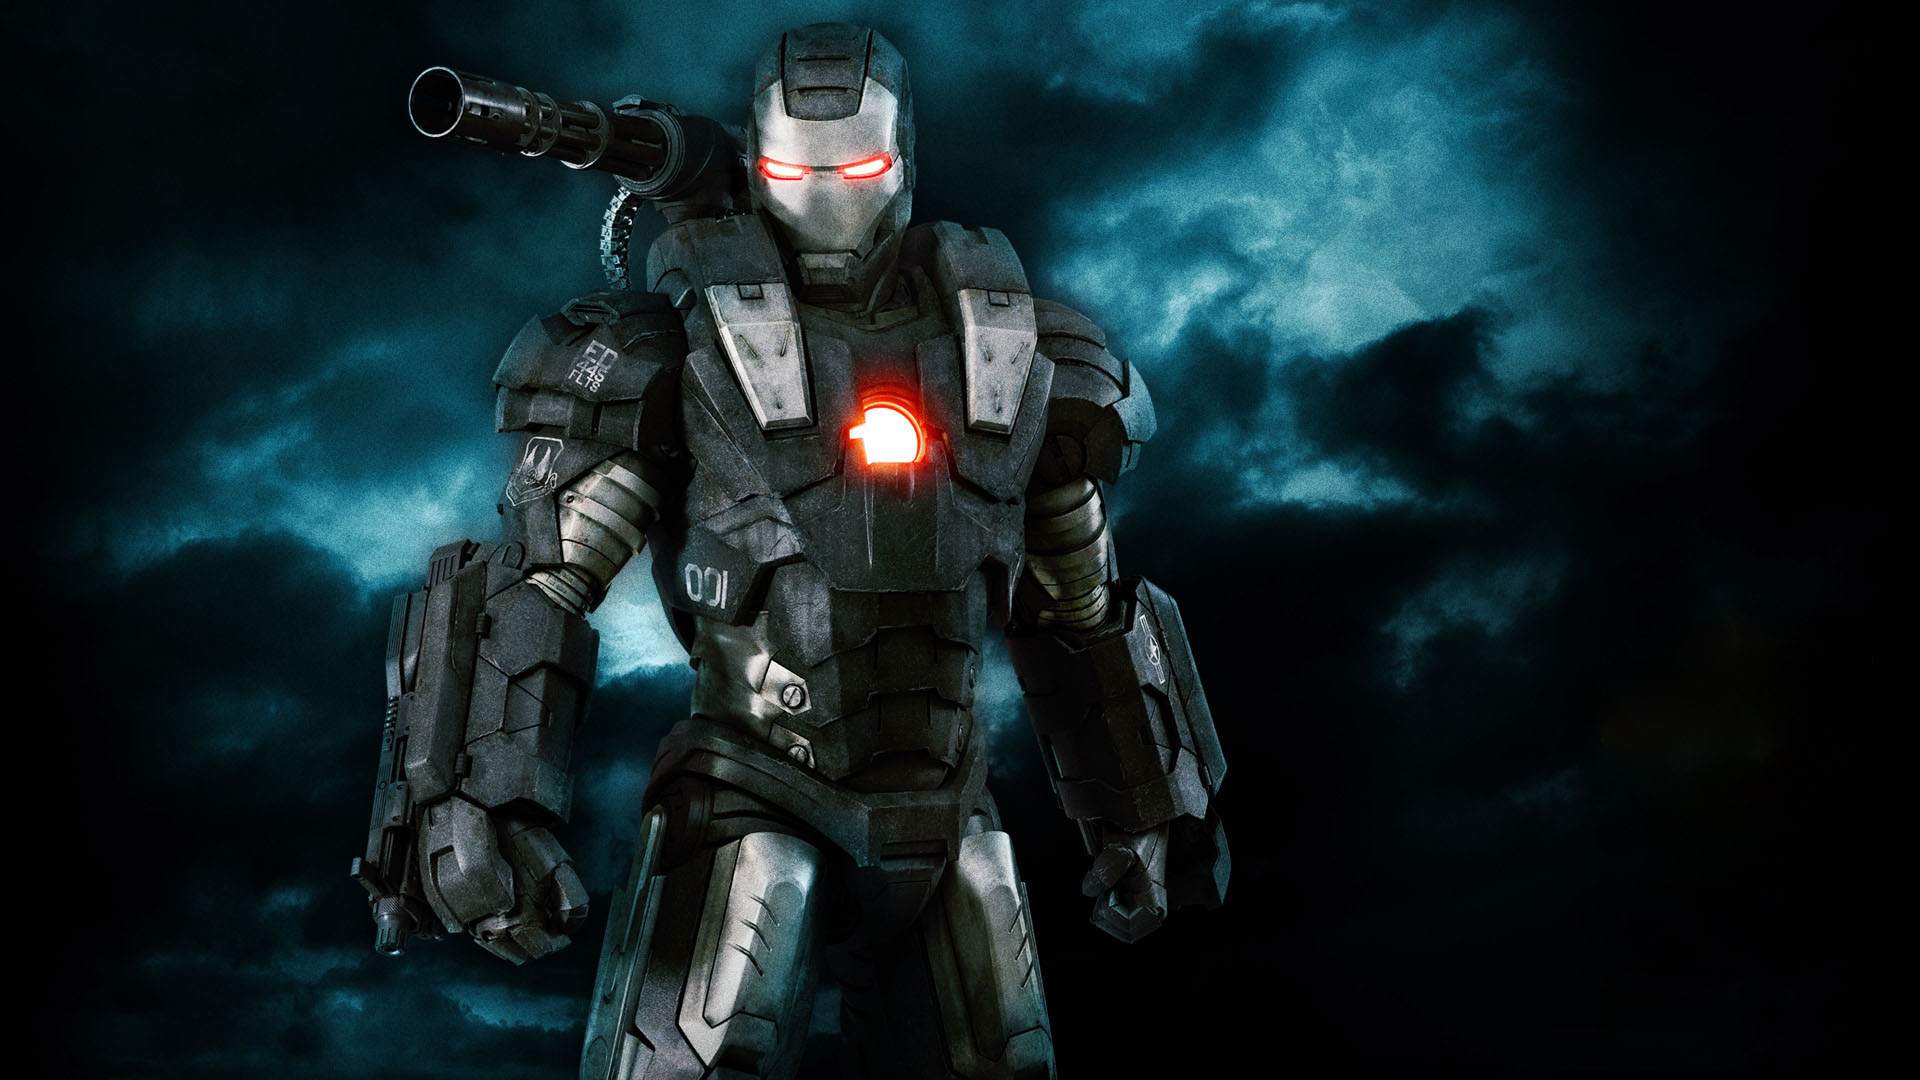 Iron Man 238 HD Wallpaper